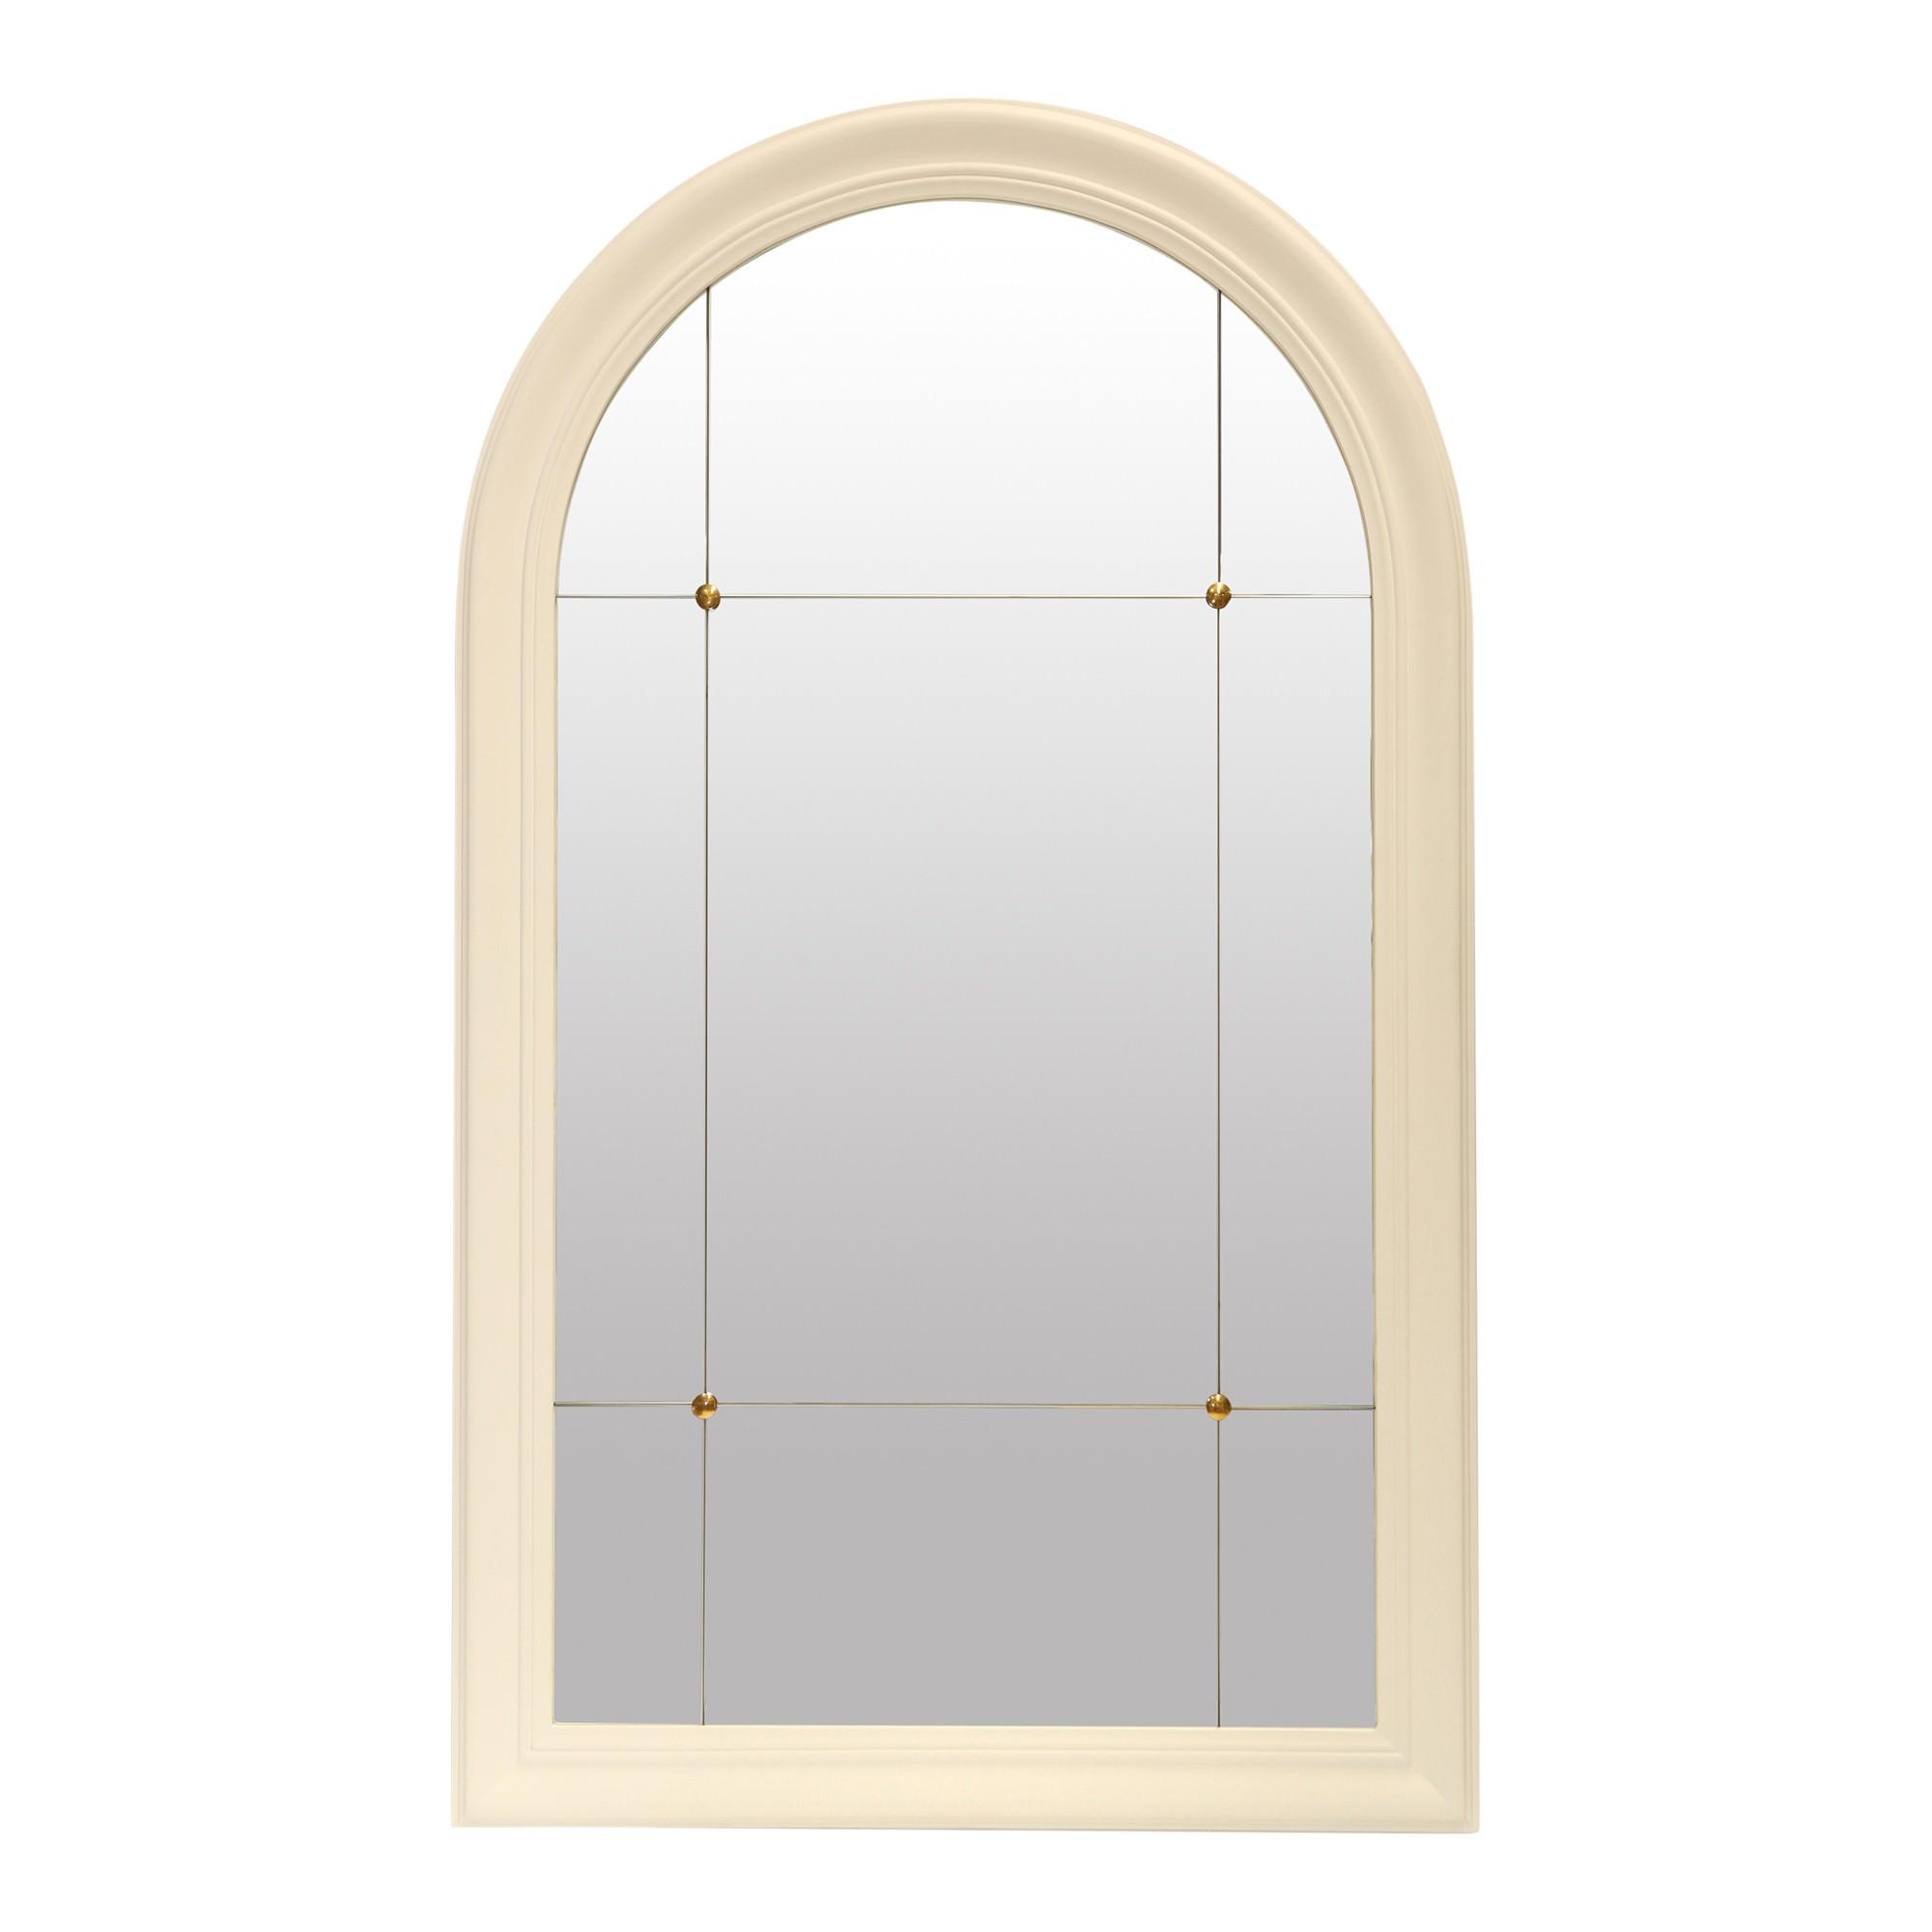 Oliver Arch Wall Mirror, 135cm